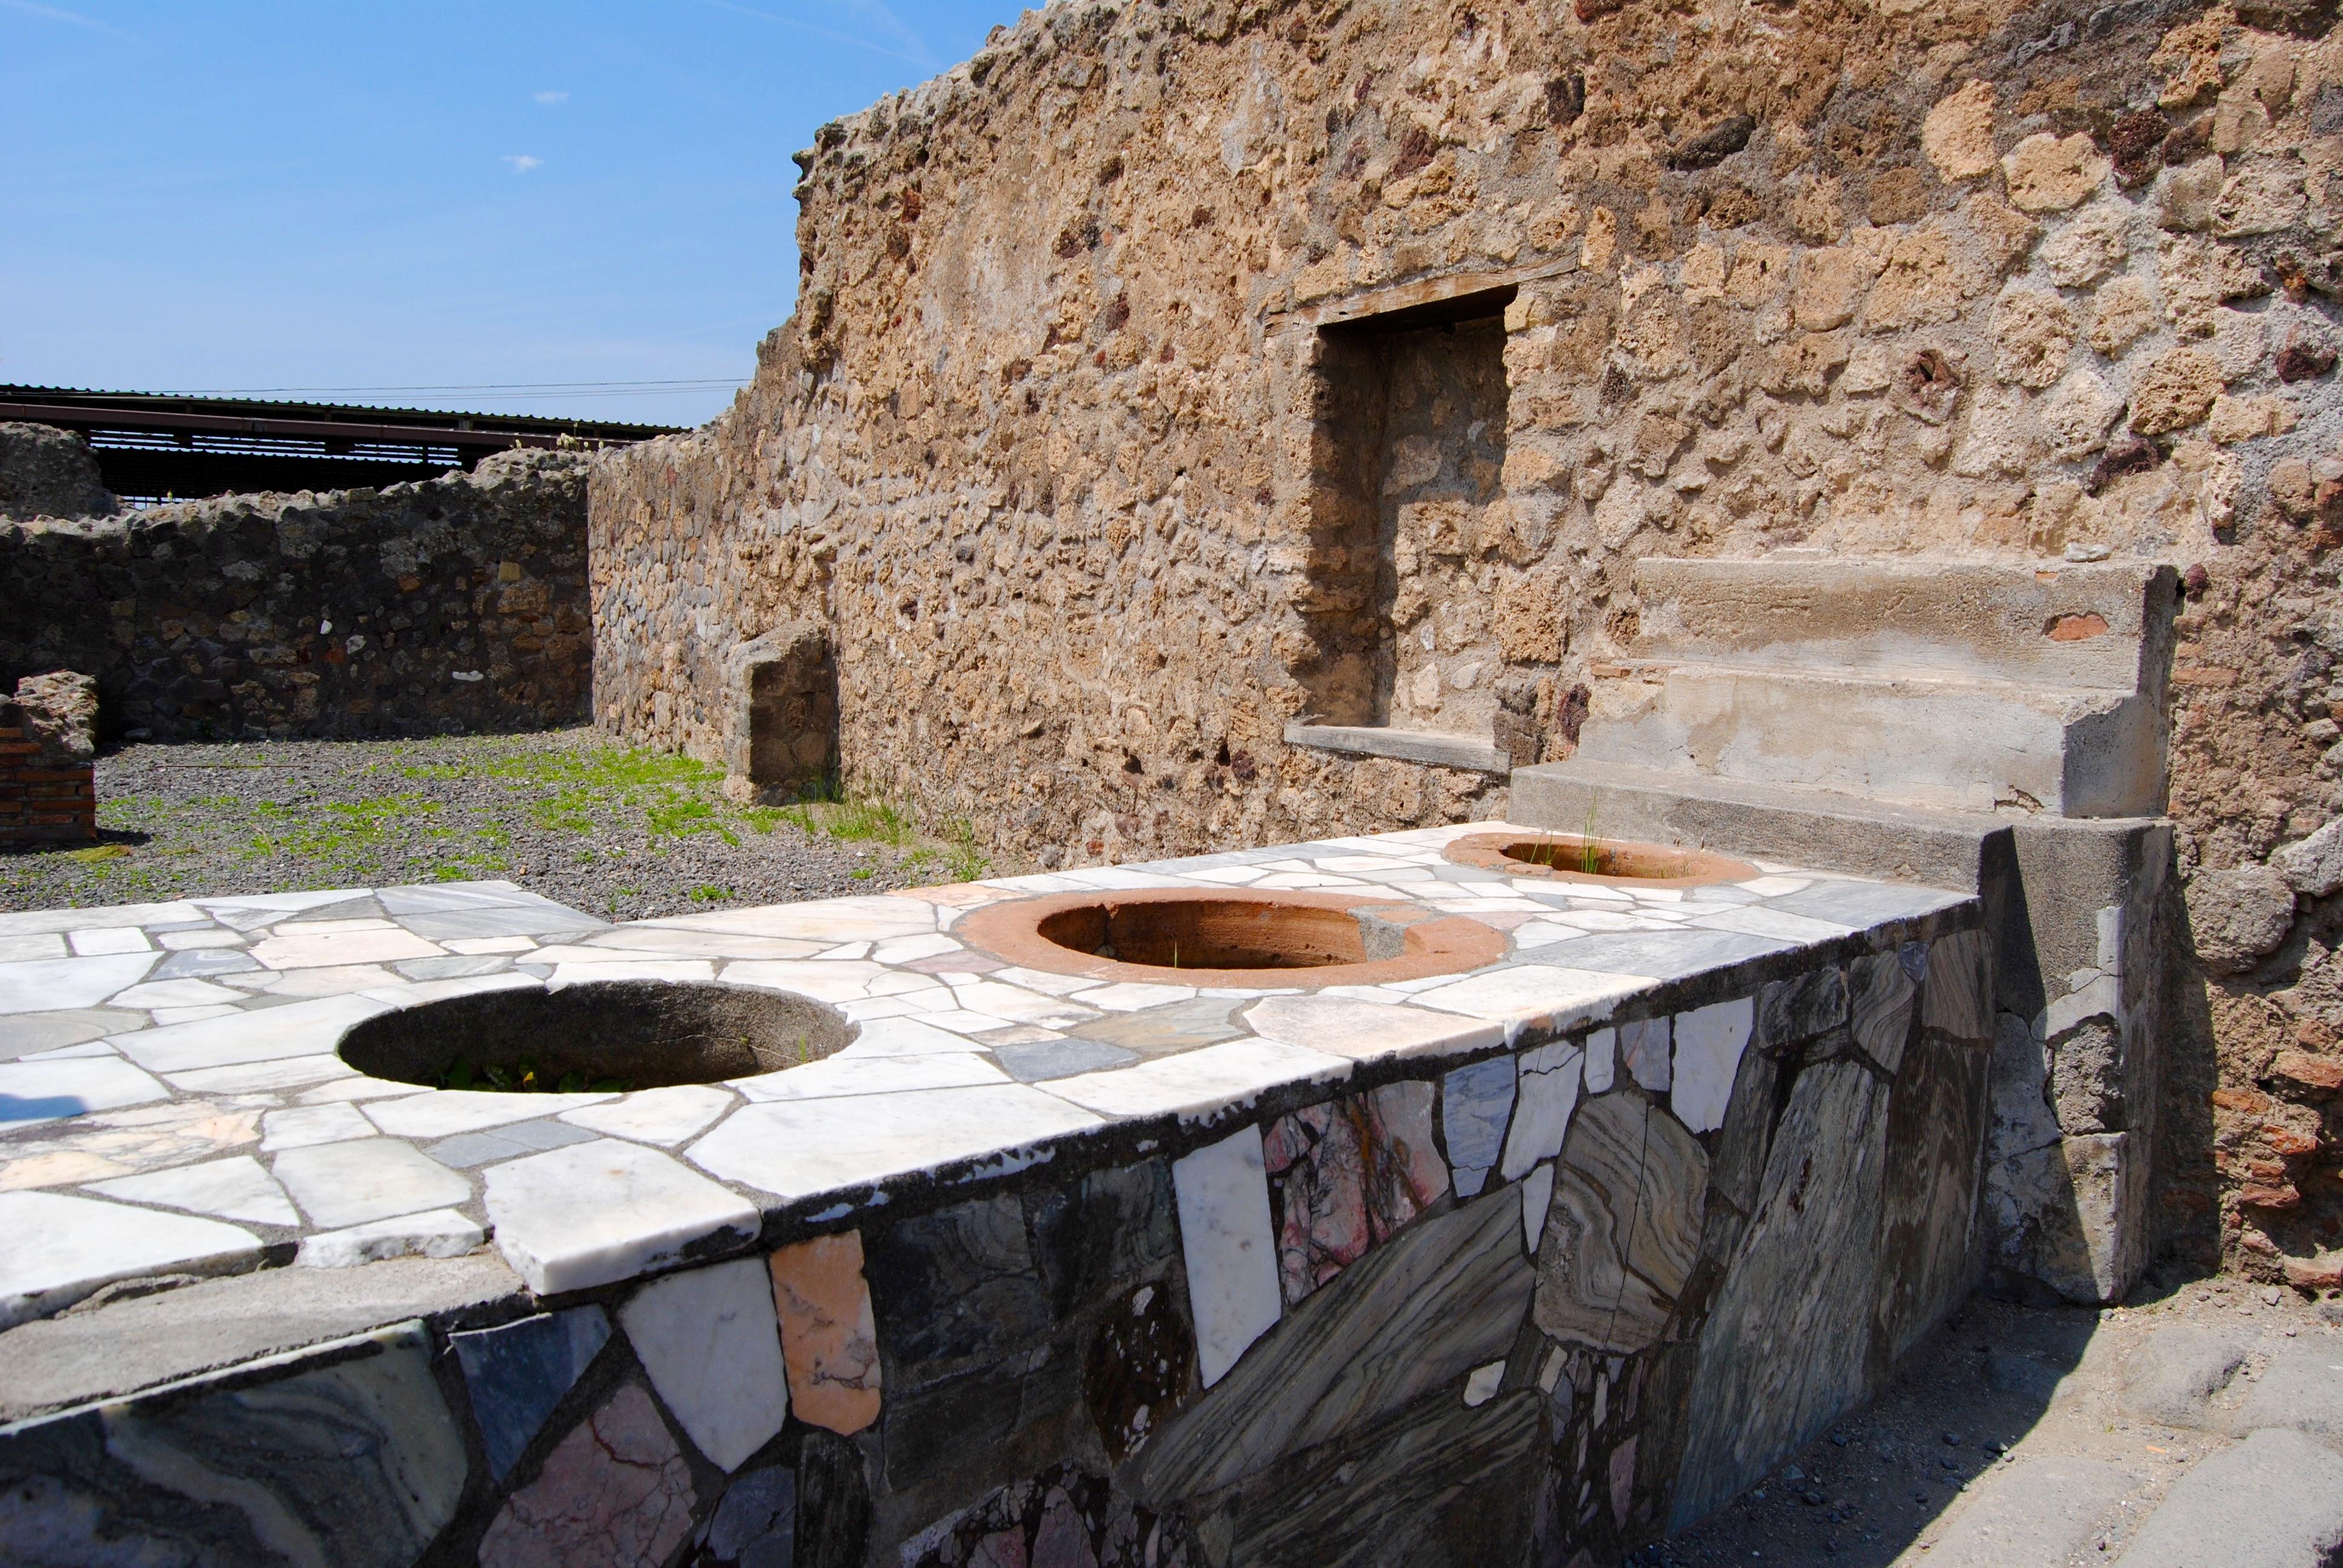 The wine bar, Pompeii style.